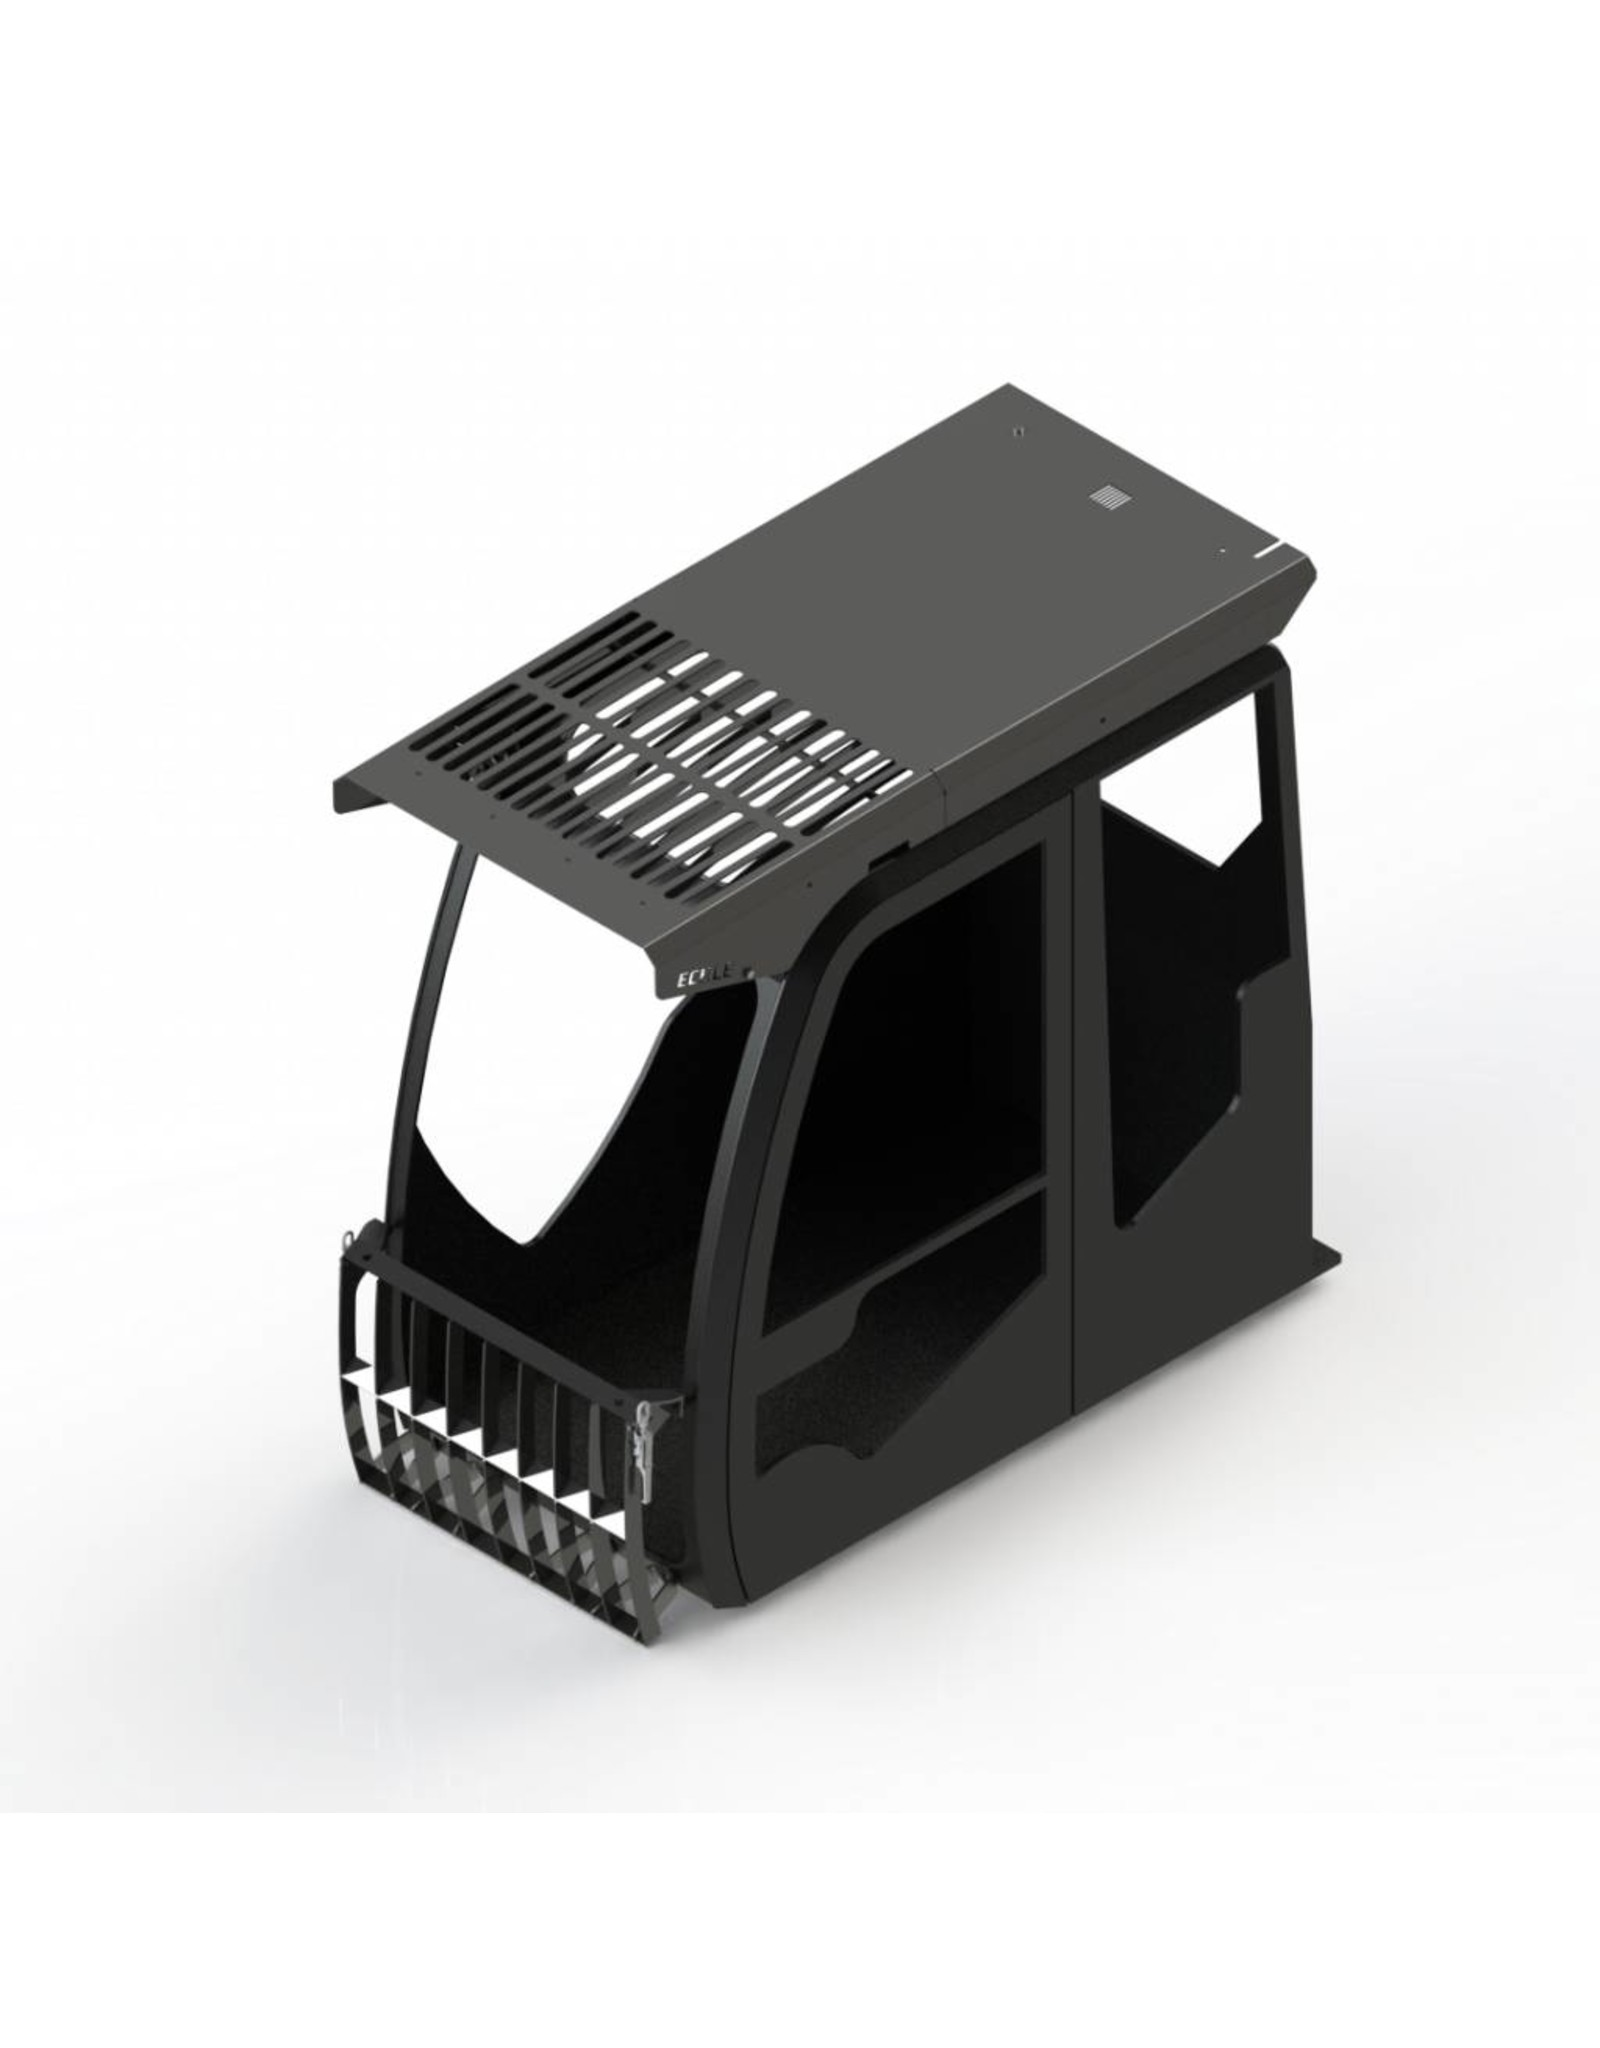 Echle Hartstahl GmbH FOPS for Liebherr A 924